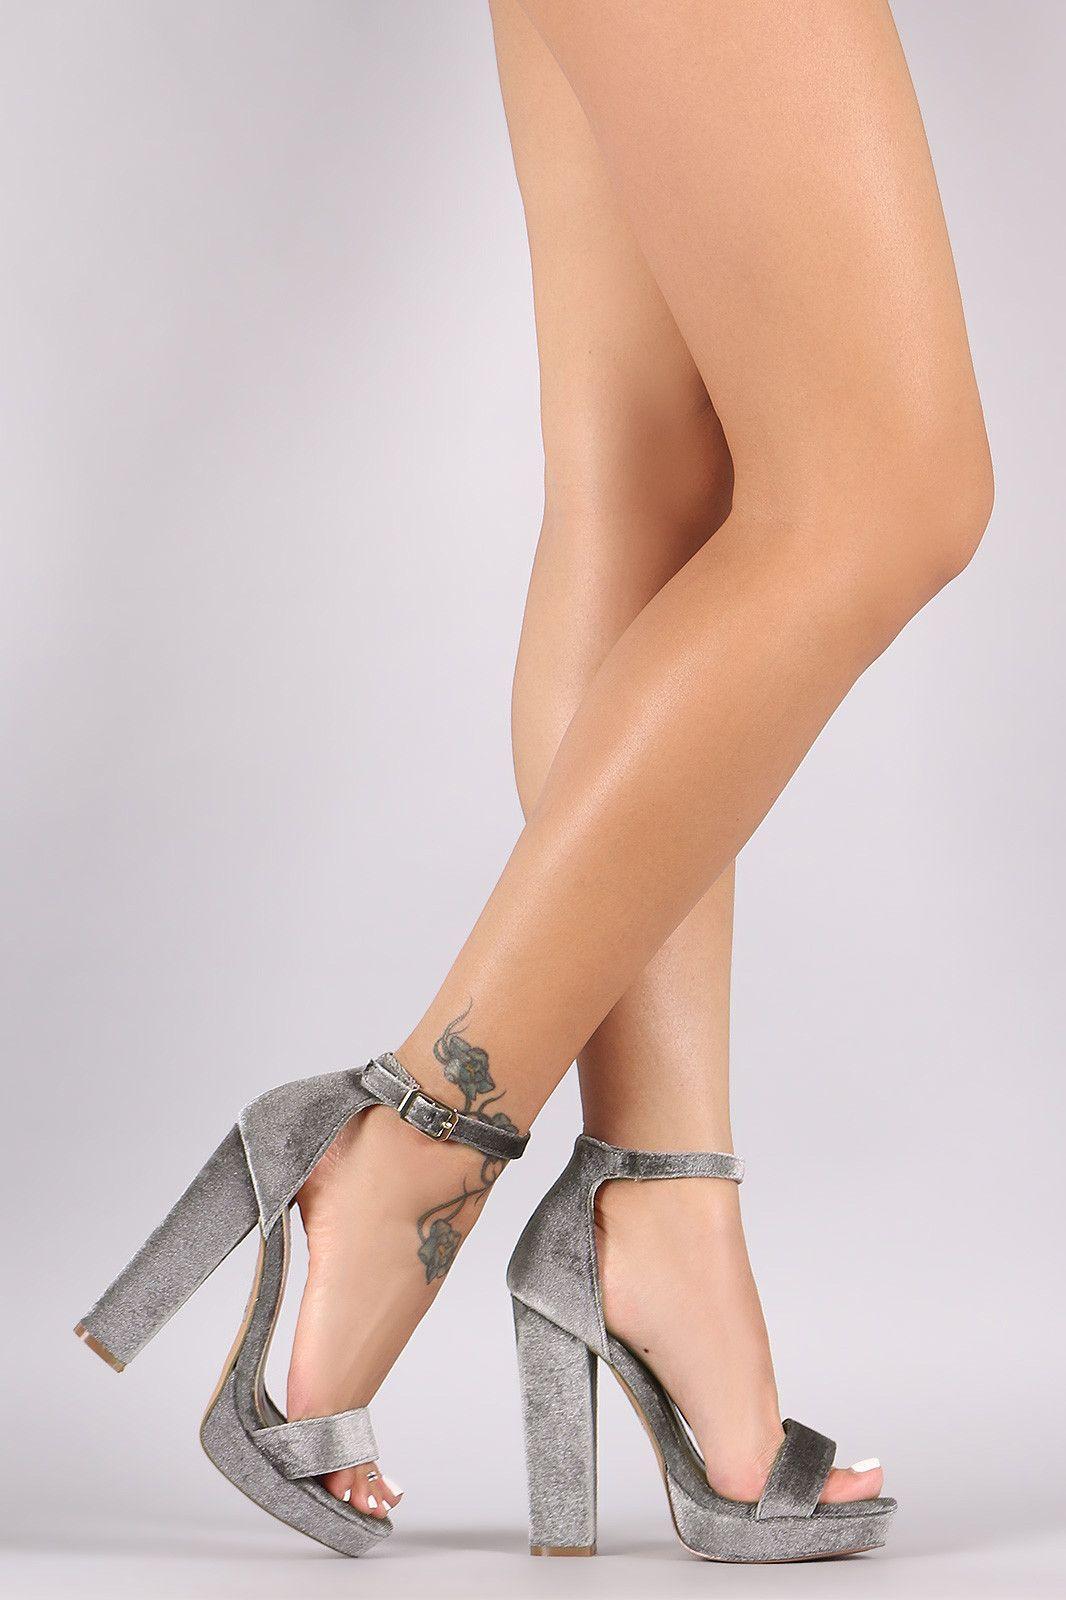 Shoe Republic LA Velvet Ankle Strap Chunky Platform Heel